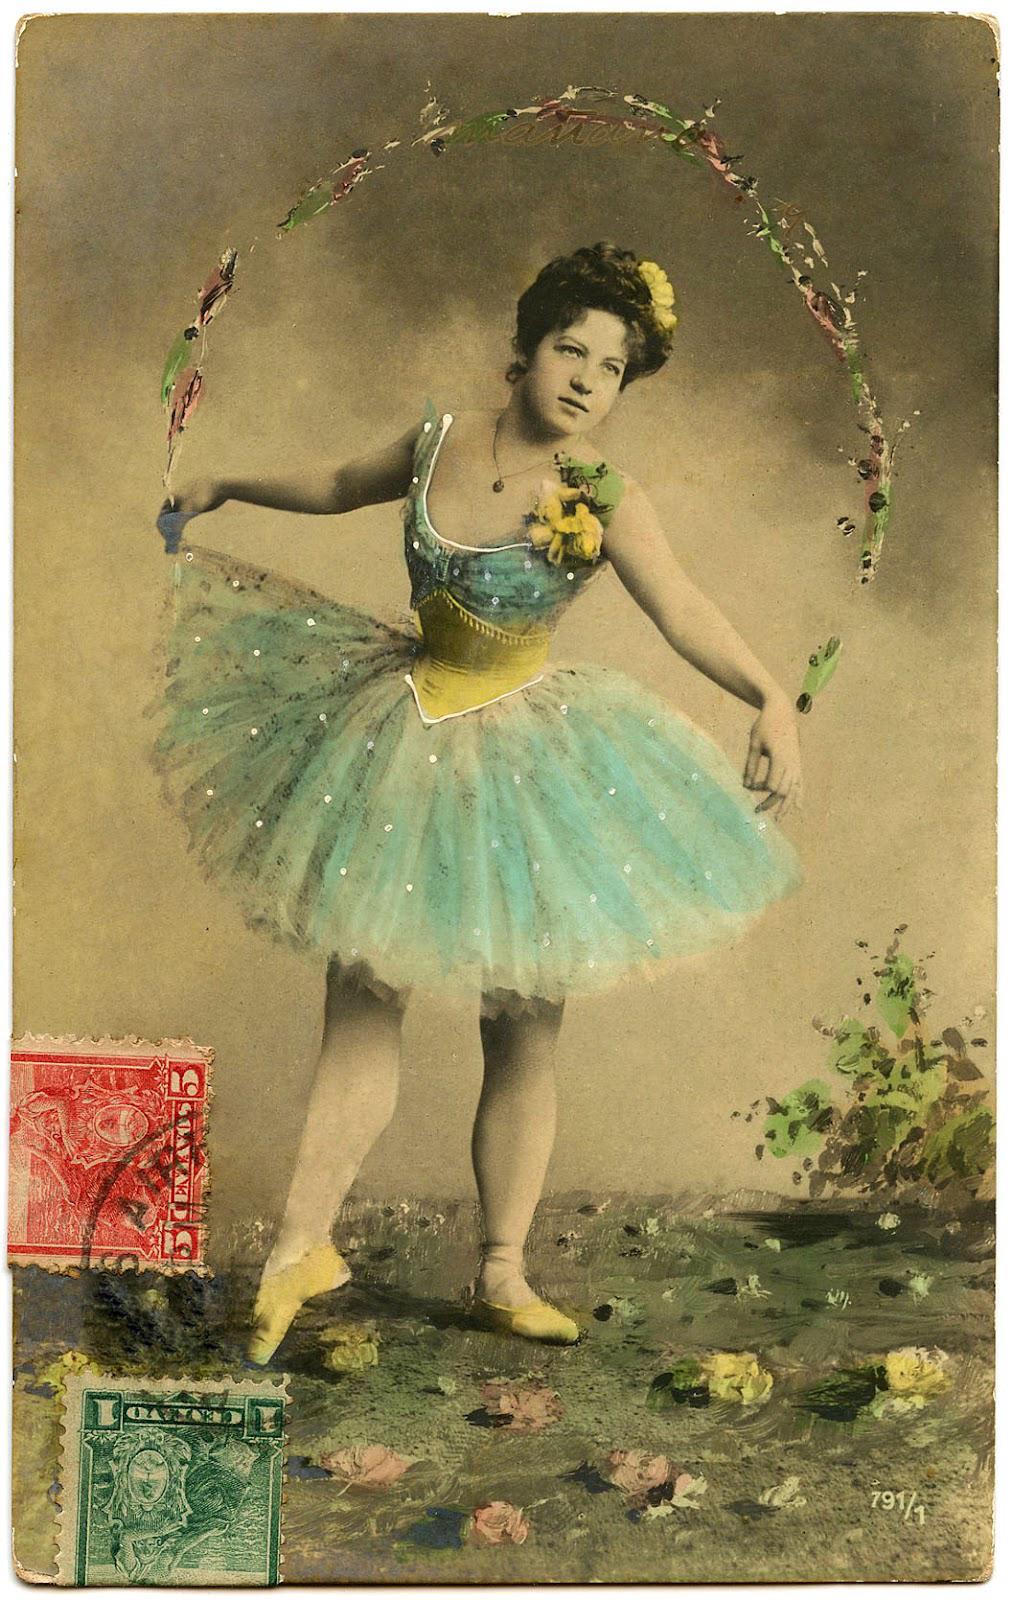 Ballerina-Blue-No-Writing-GraphicsFairy